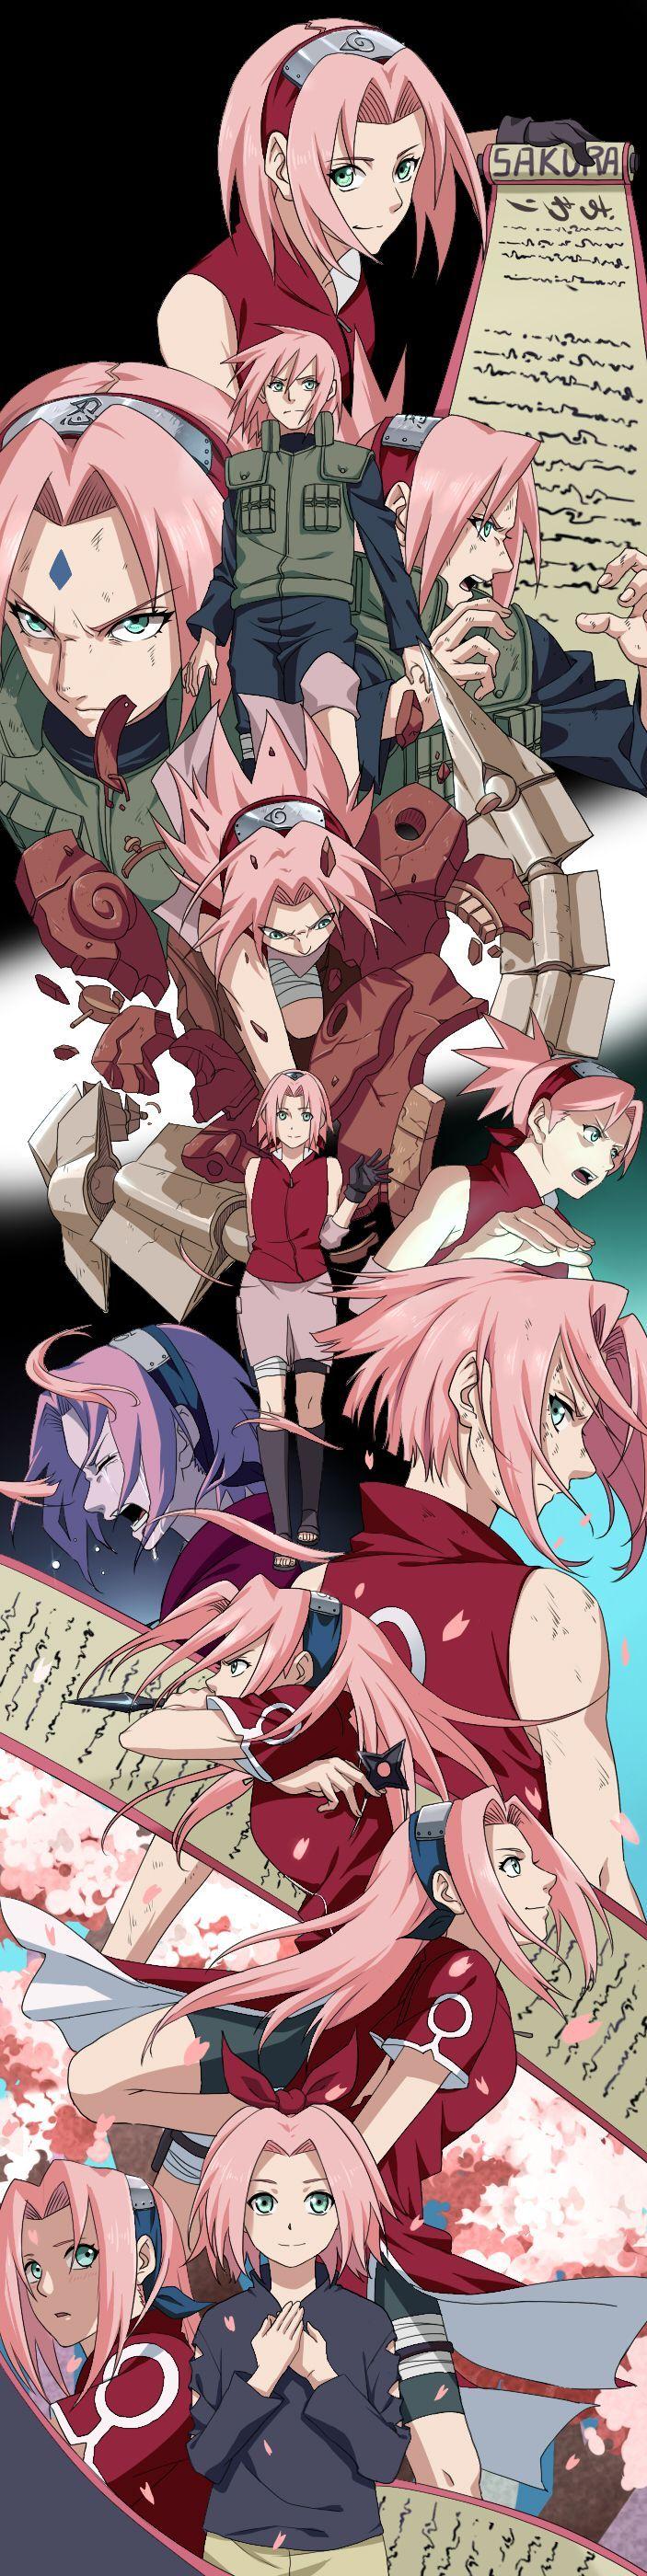 Sakura--Bem Vindo--どういたしまして--you welcome